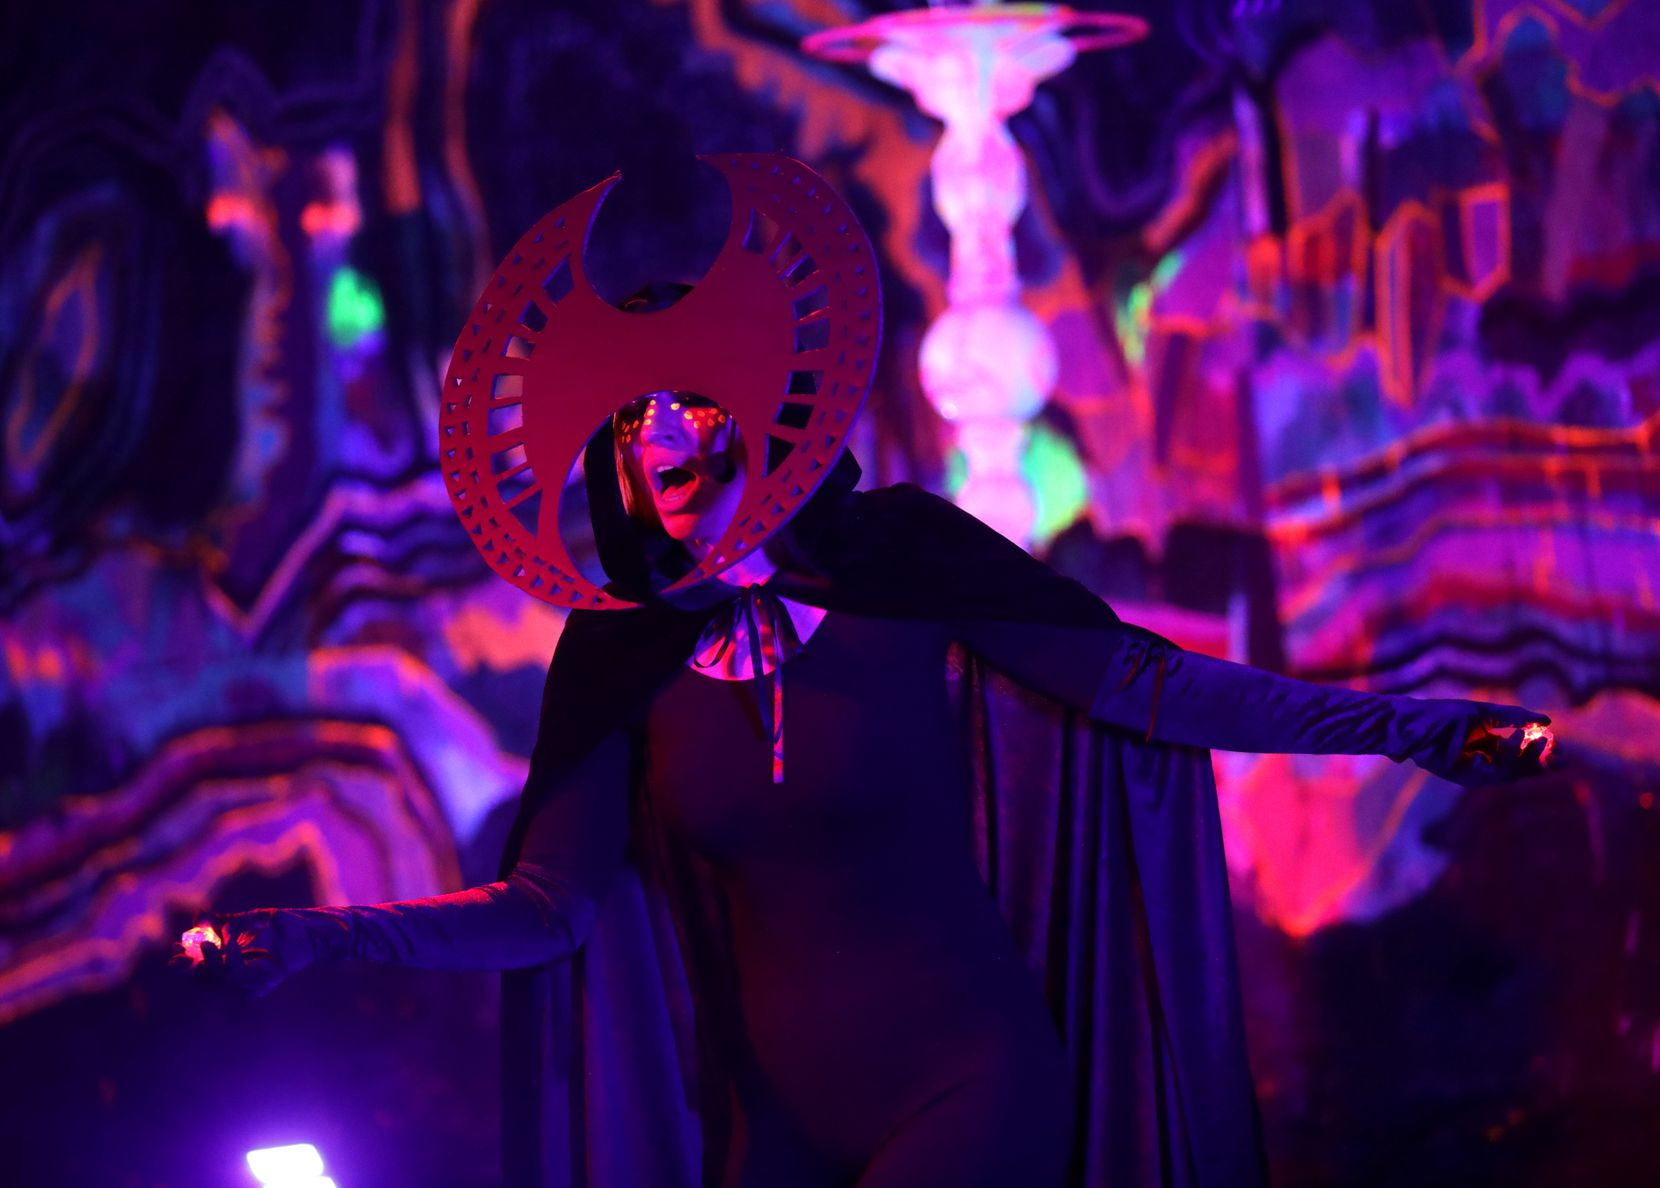 Poppy Xander appears in a heavy-duty costume designed by Teddy Waggy.